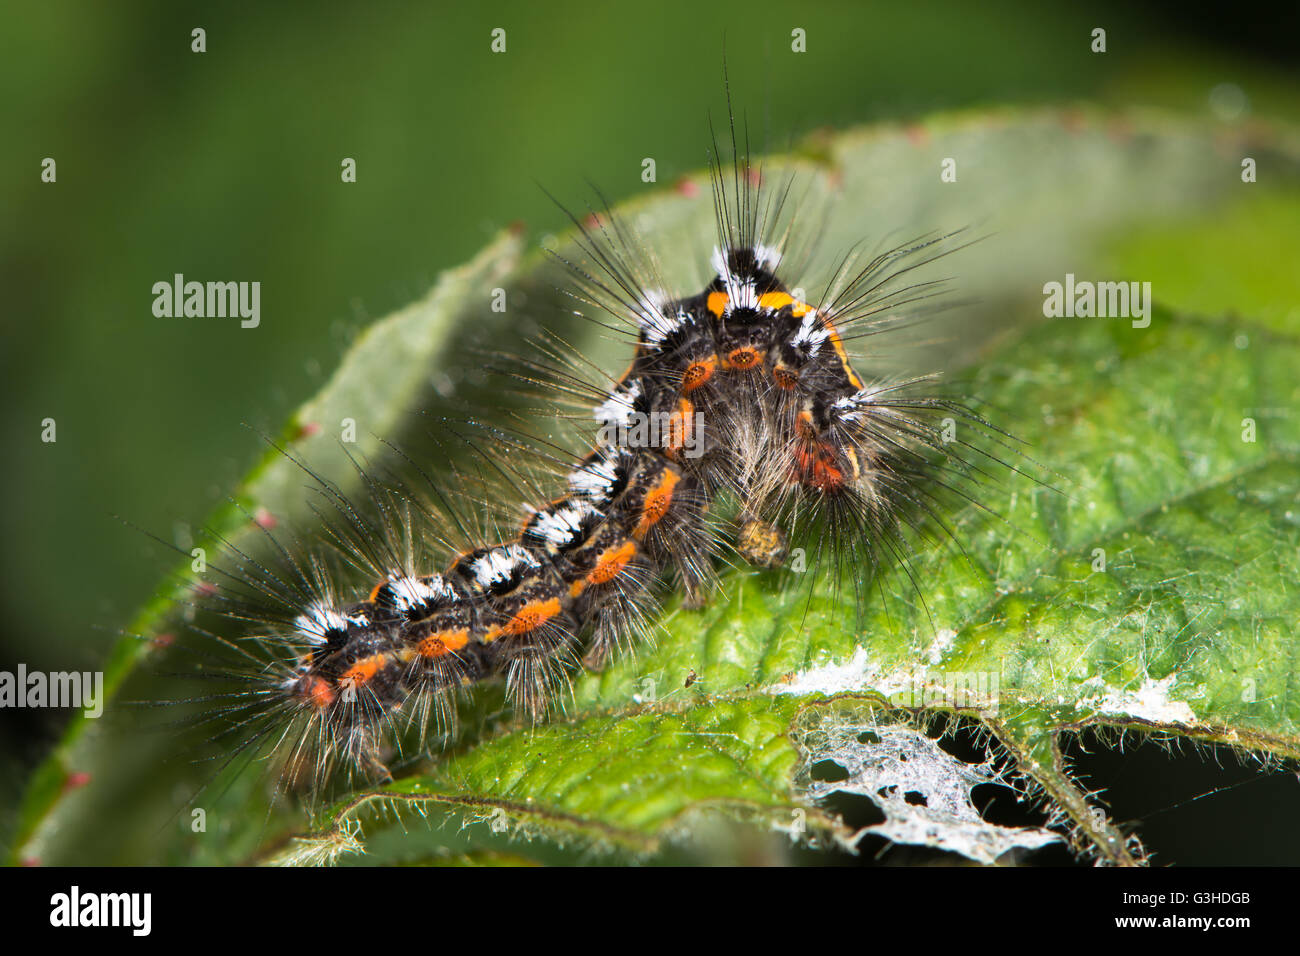 Gelb-Tail Motte (Euproctis Similis) Raupe. Larve der Motte in der Familie Erebidae (ehemals Lymantriidae) bedeckt Stockbild